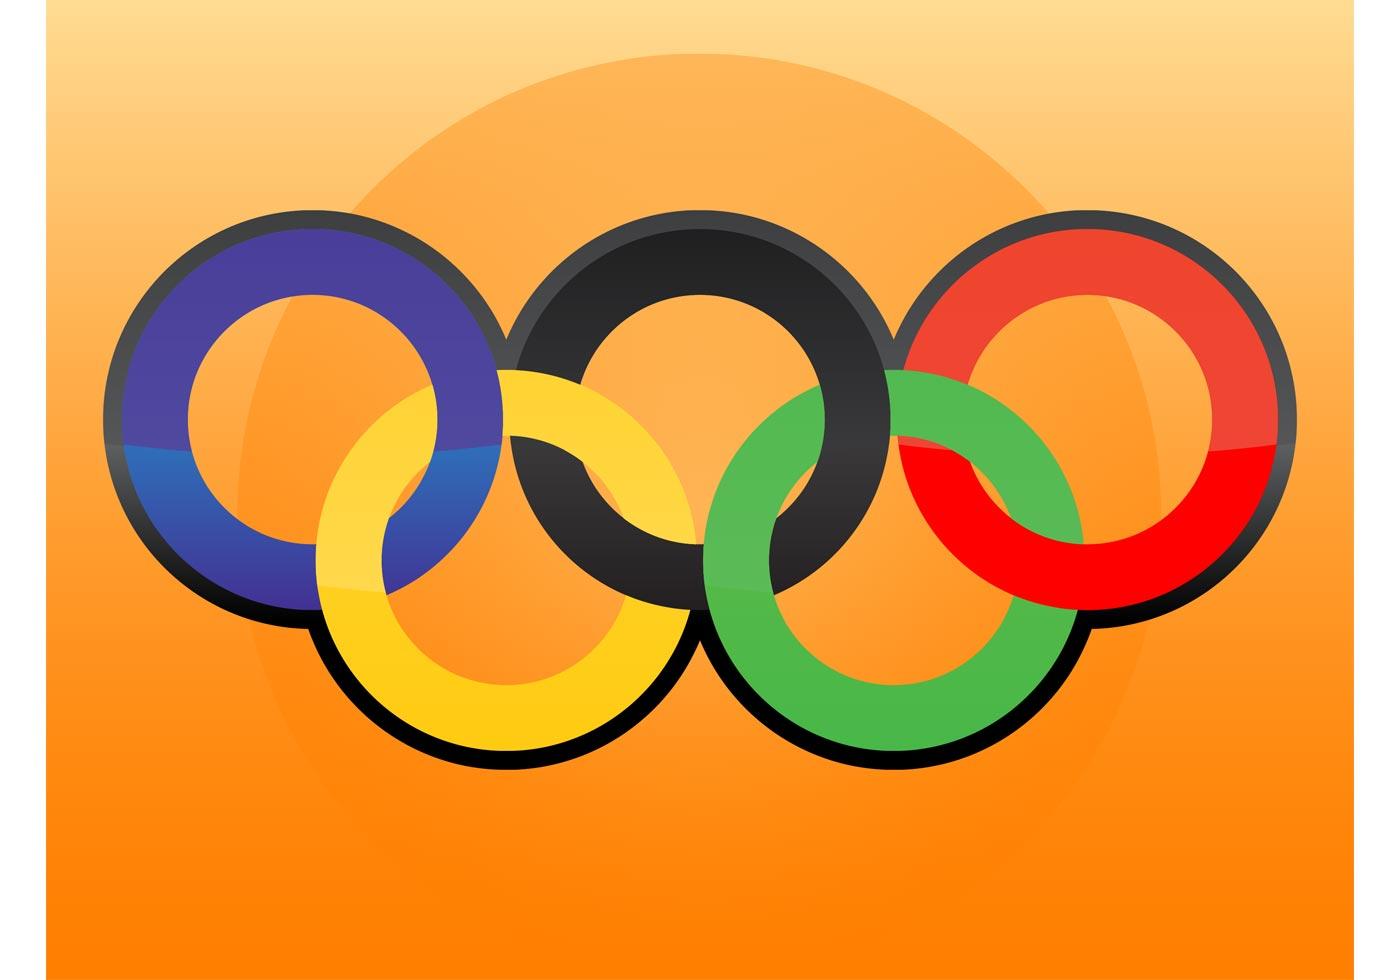 Olympic Logo Vector - Download Free Vector Art, Stock ...